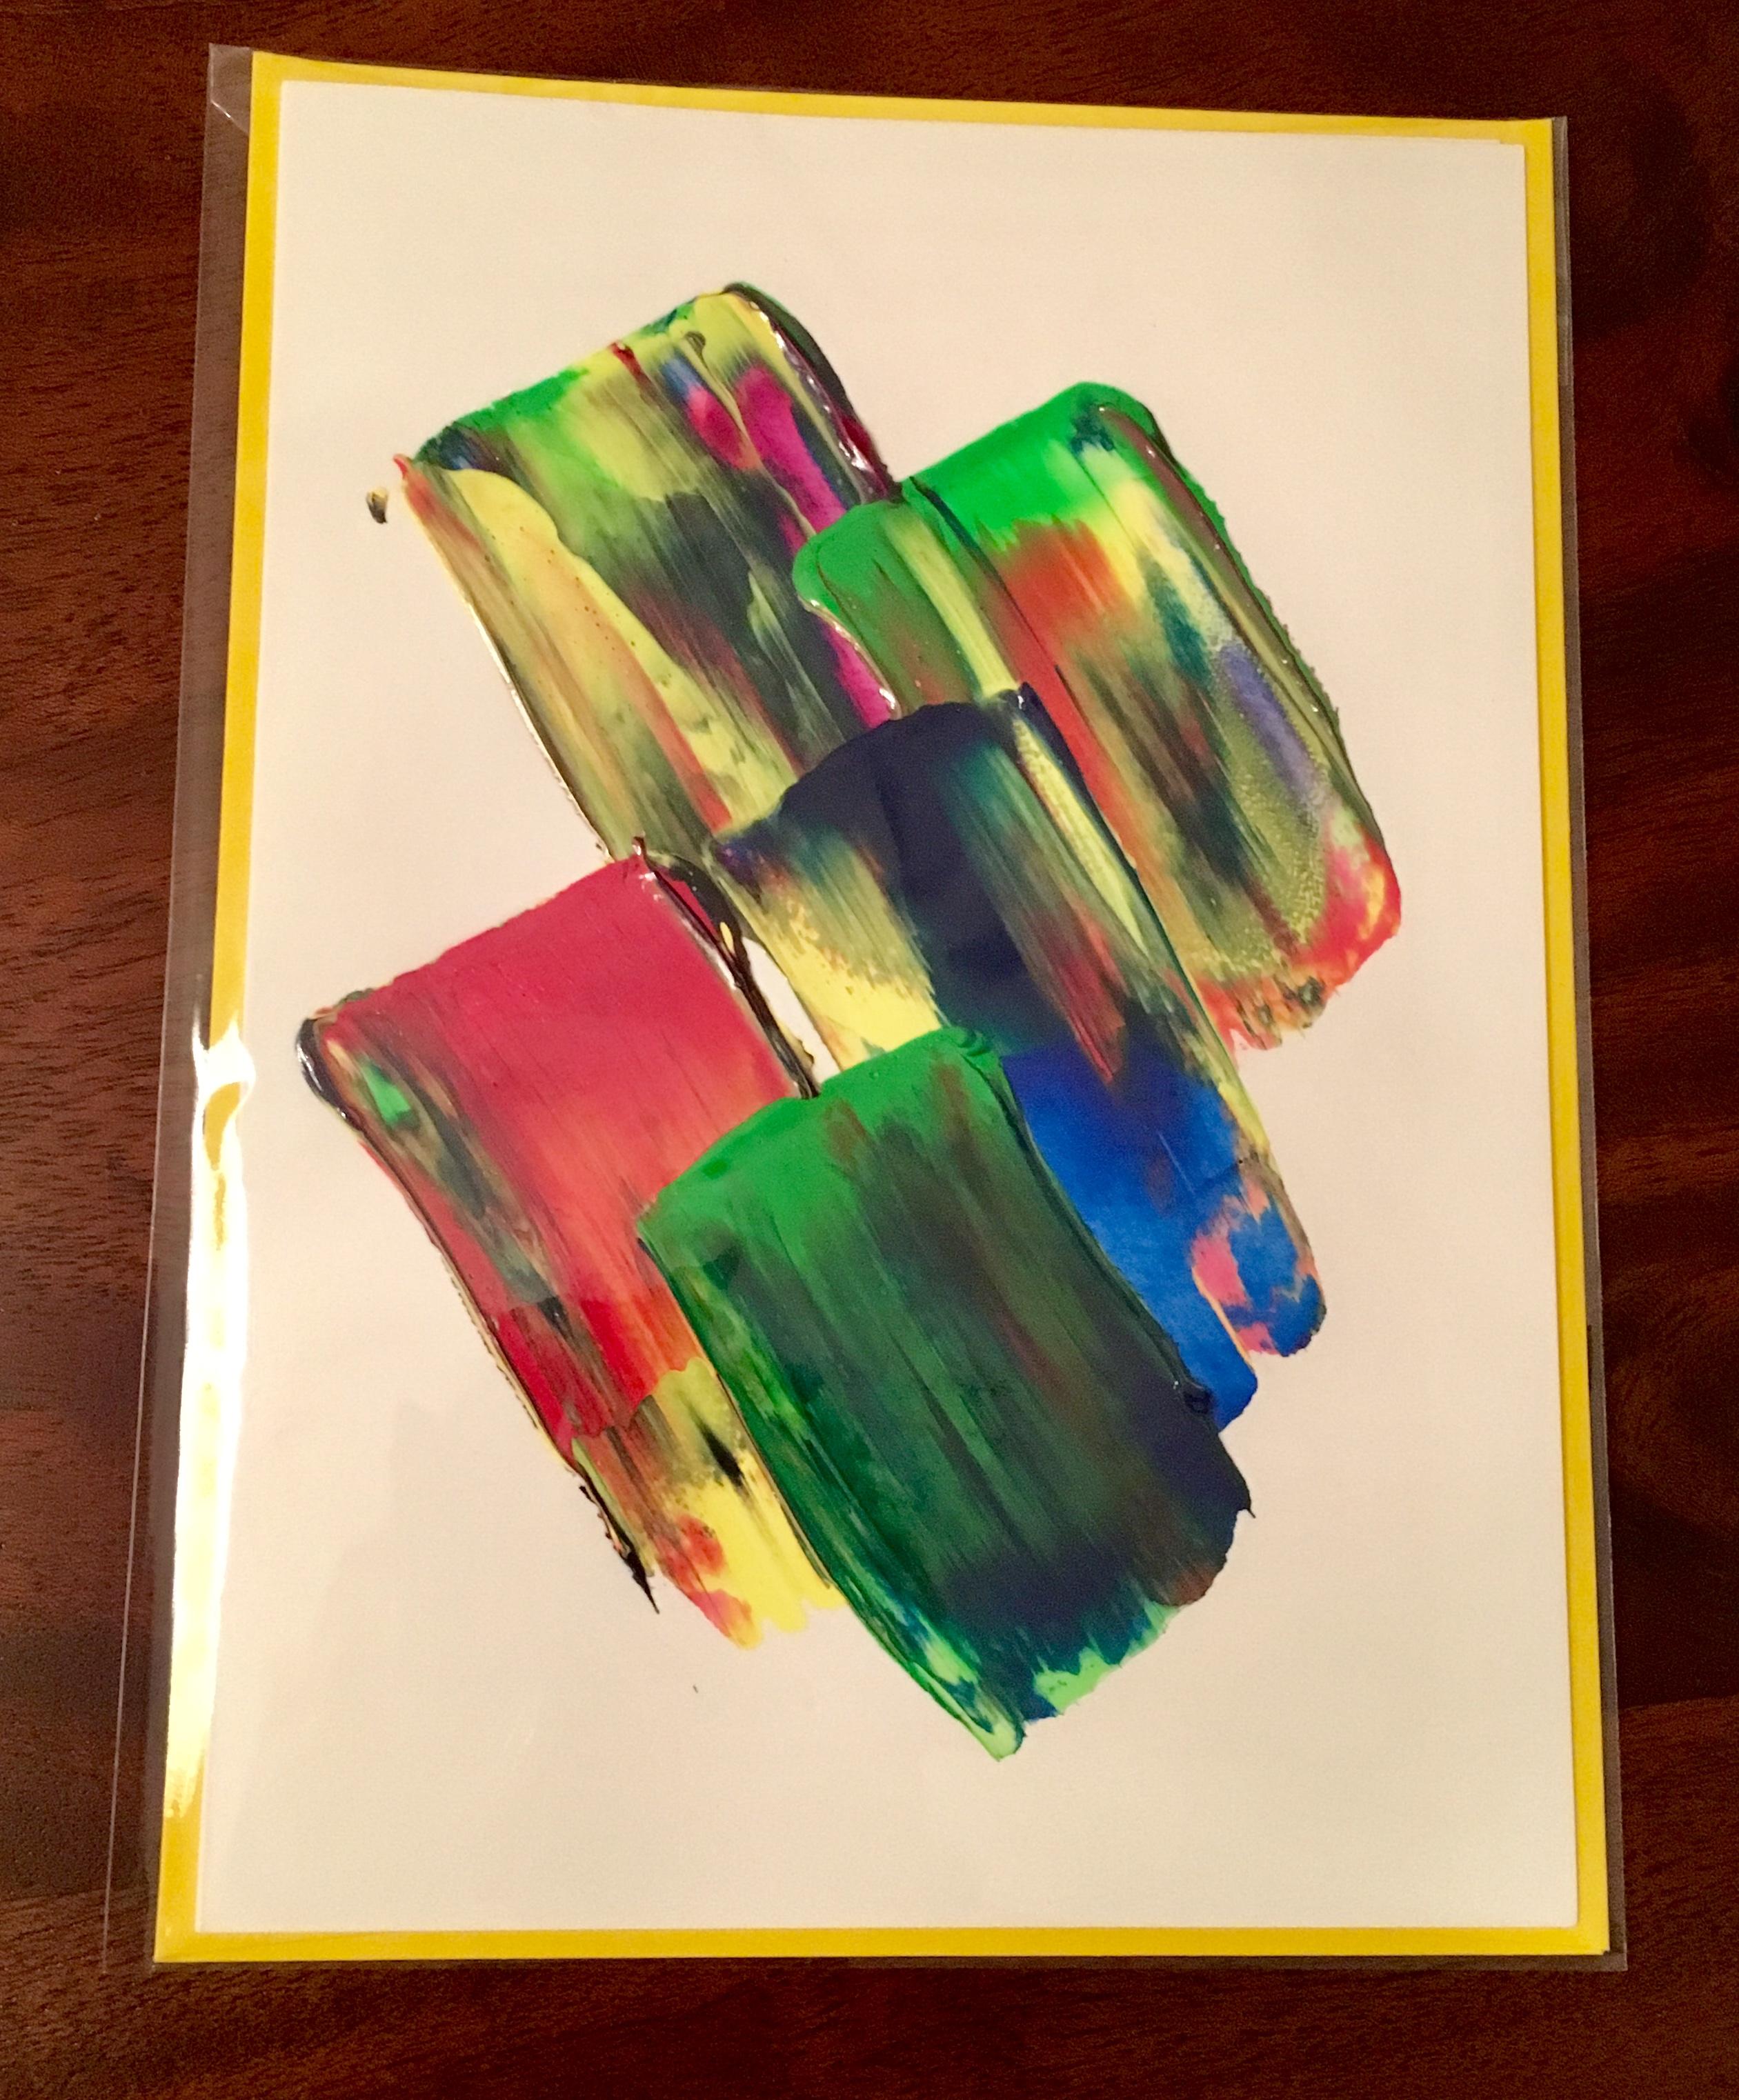 Sample packaged handmade card